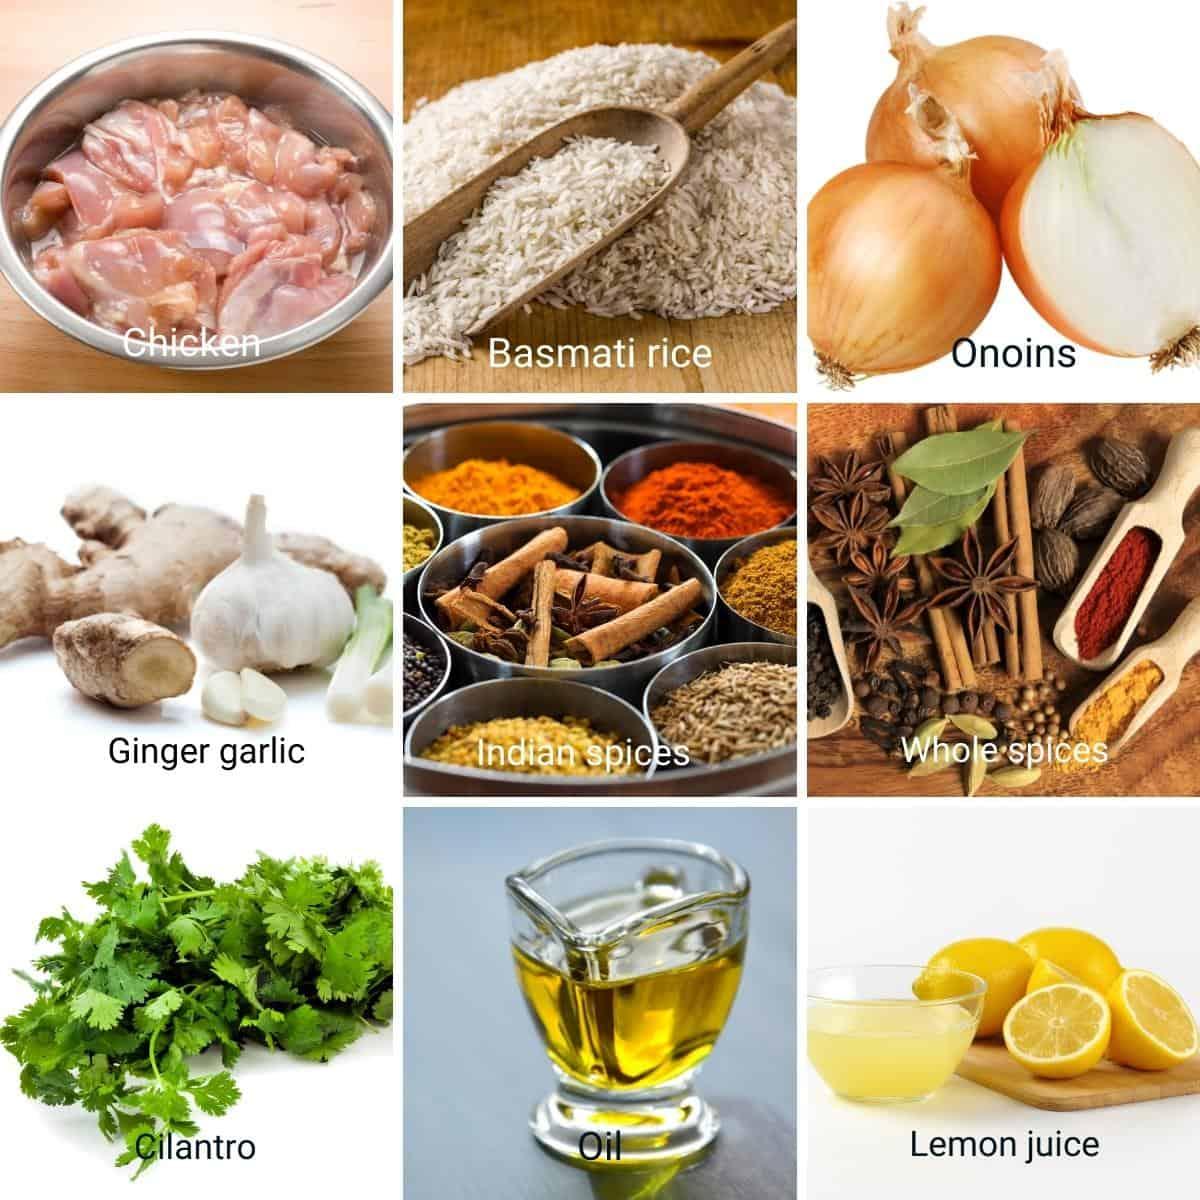 Ingredients for chicken biryani.